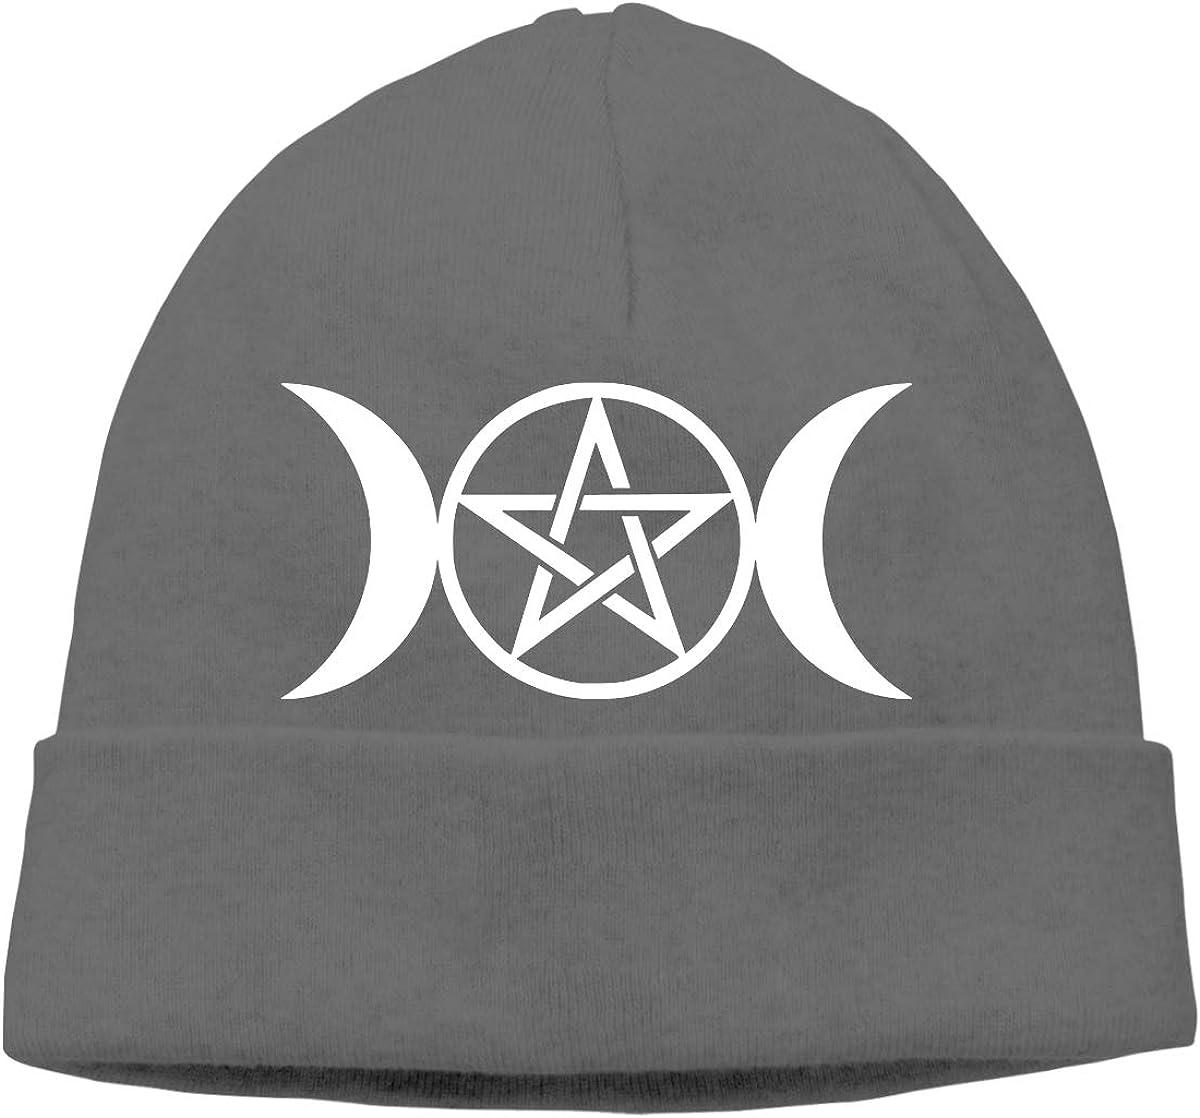 JTTYU Triple Moon Pentacle Pagan Platinum Unisex Winter Warm Hats Men Women Hat Skull Cap